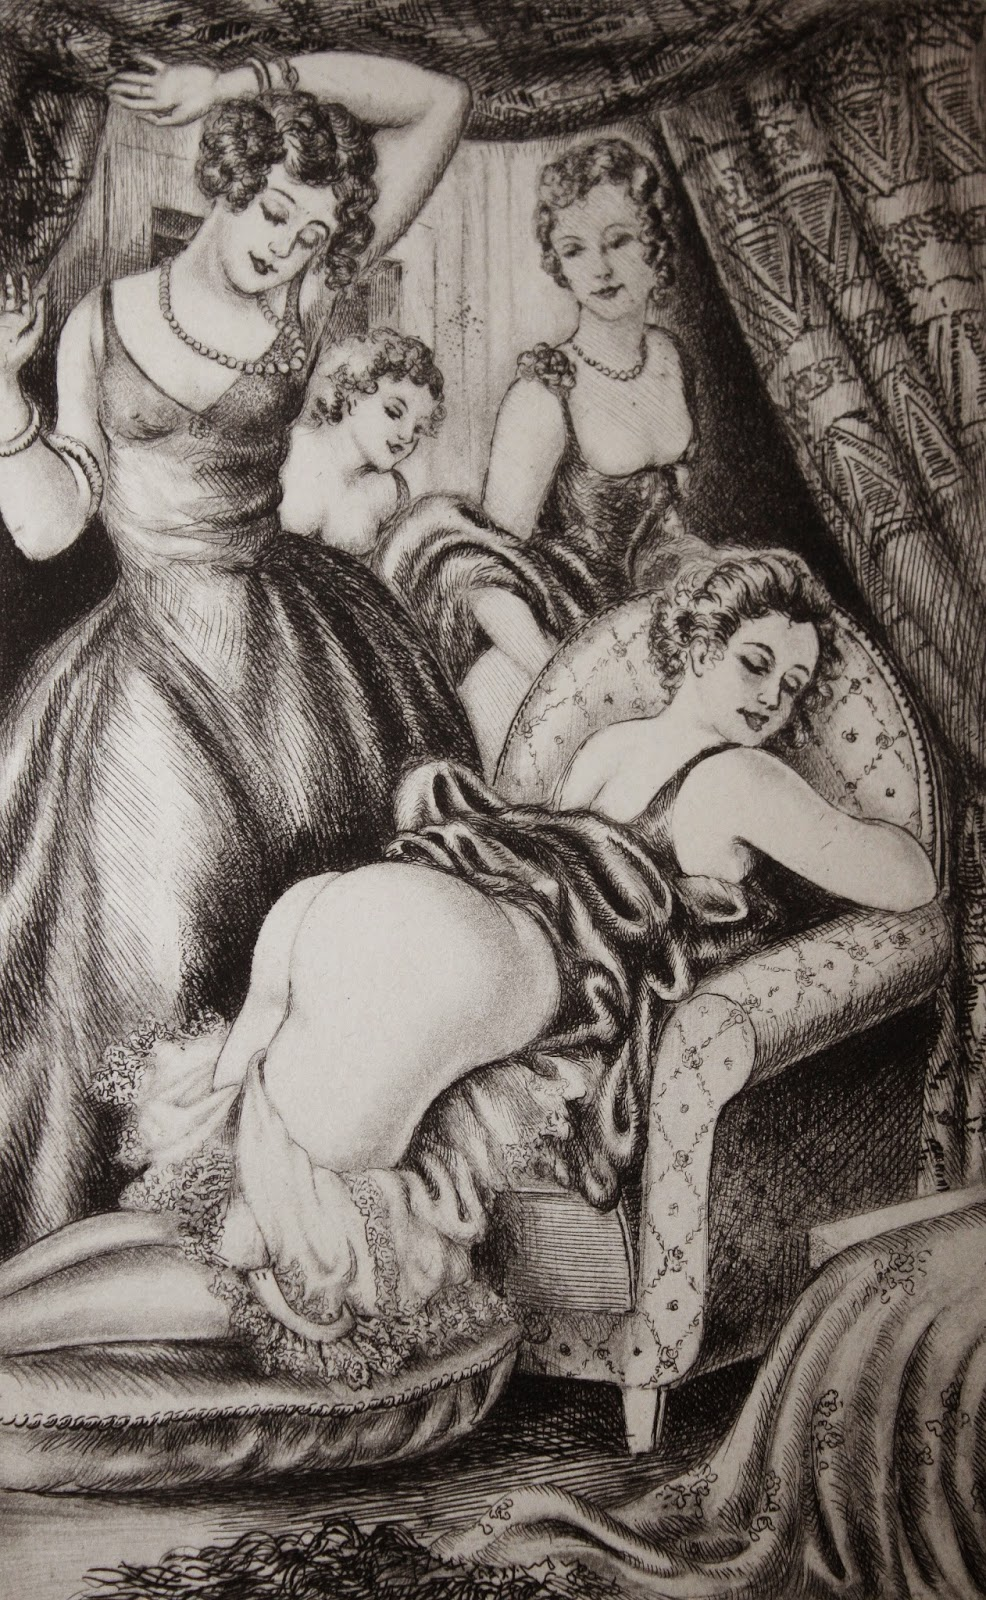 Chinoise sex - Galeries d'images porno asiatique et image